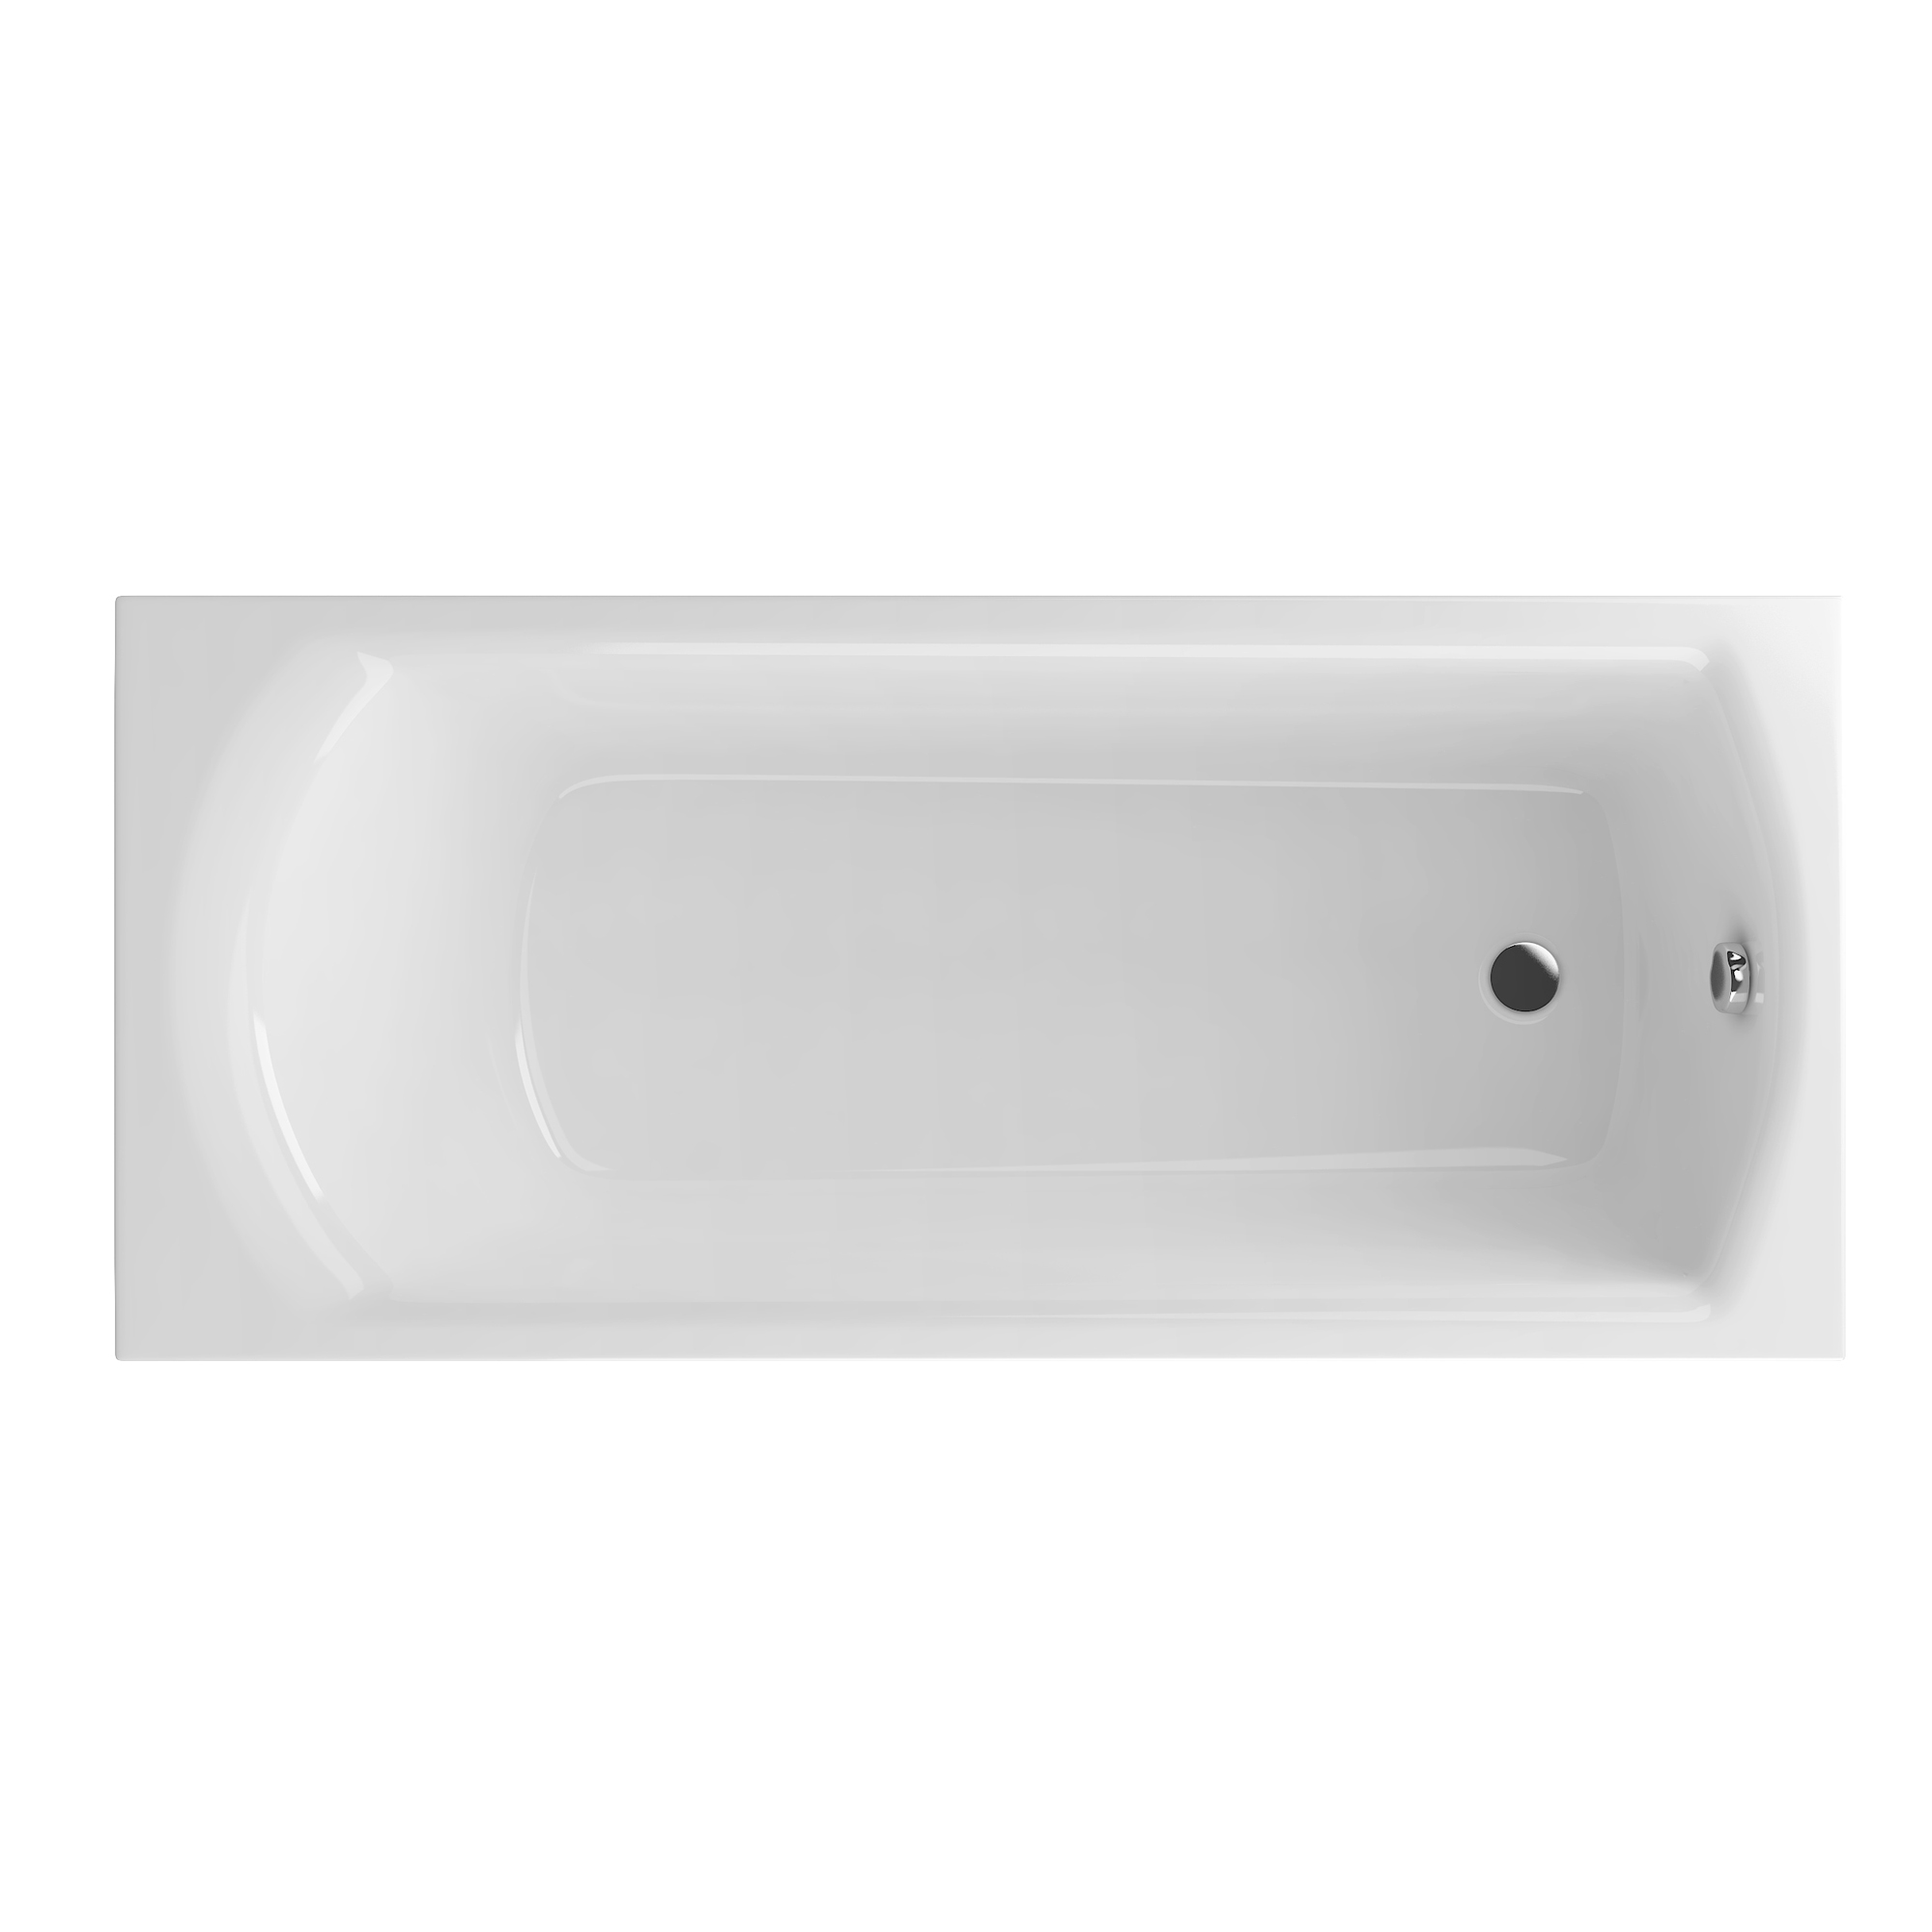 Акриловая ванна Excellent Lamia 160x75 без гидромассажа акриловая ванна excellent pryzmat 160x75 без гидромассажа